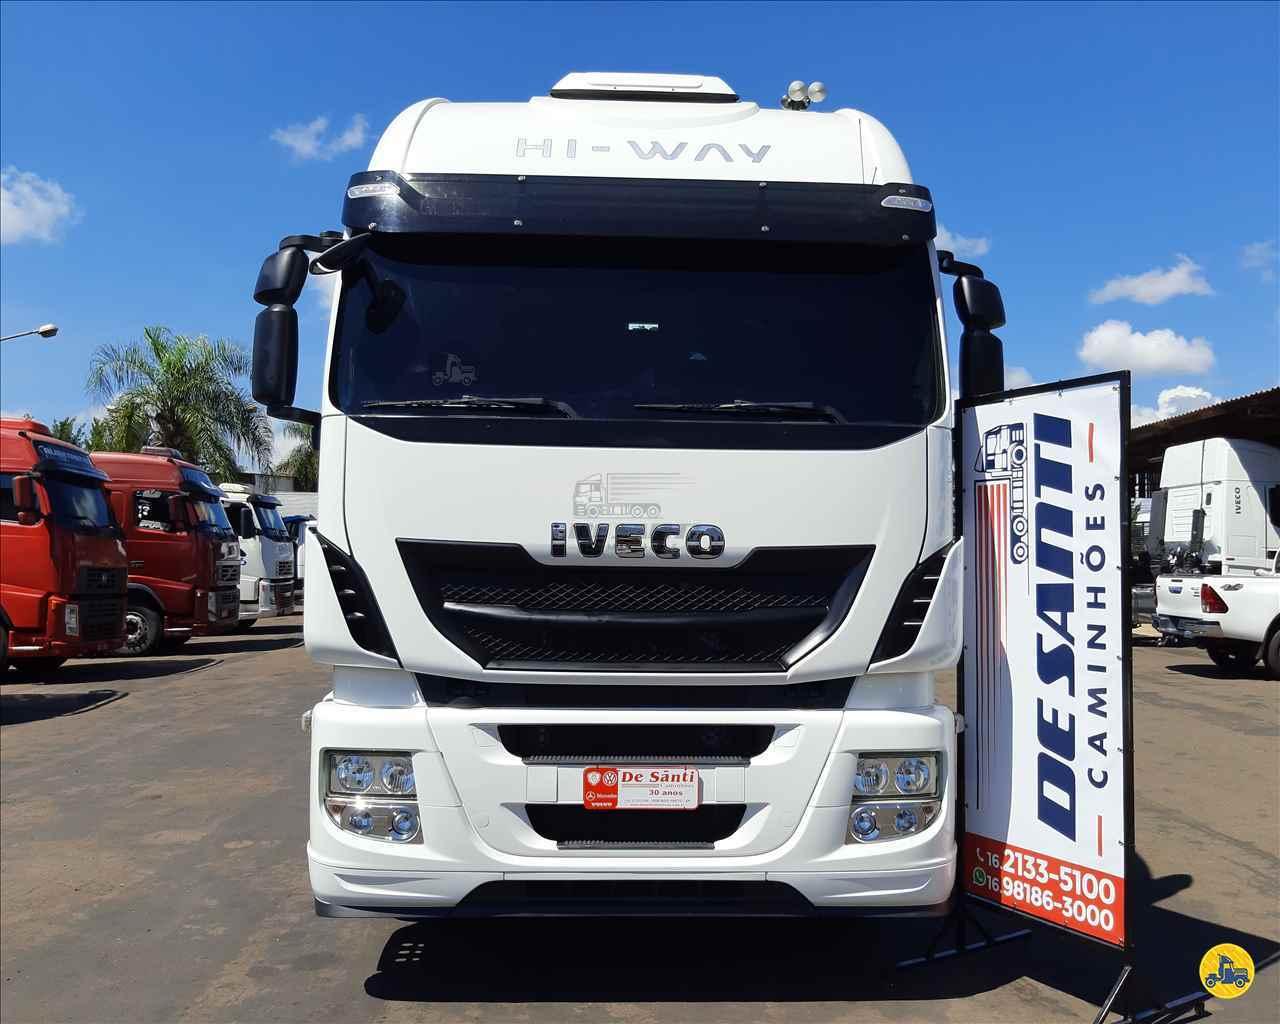 IVECO STRALIS 440 118999km 2019/2019 De Santi Caminhões